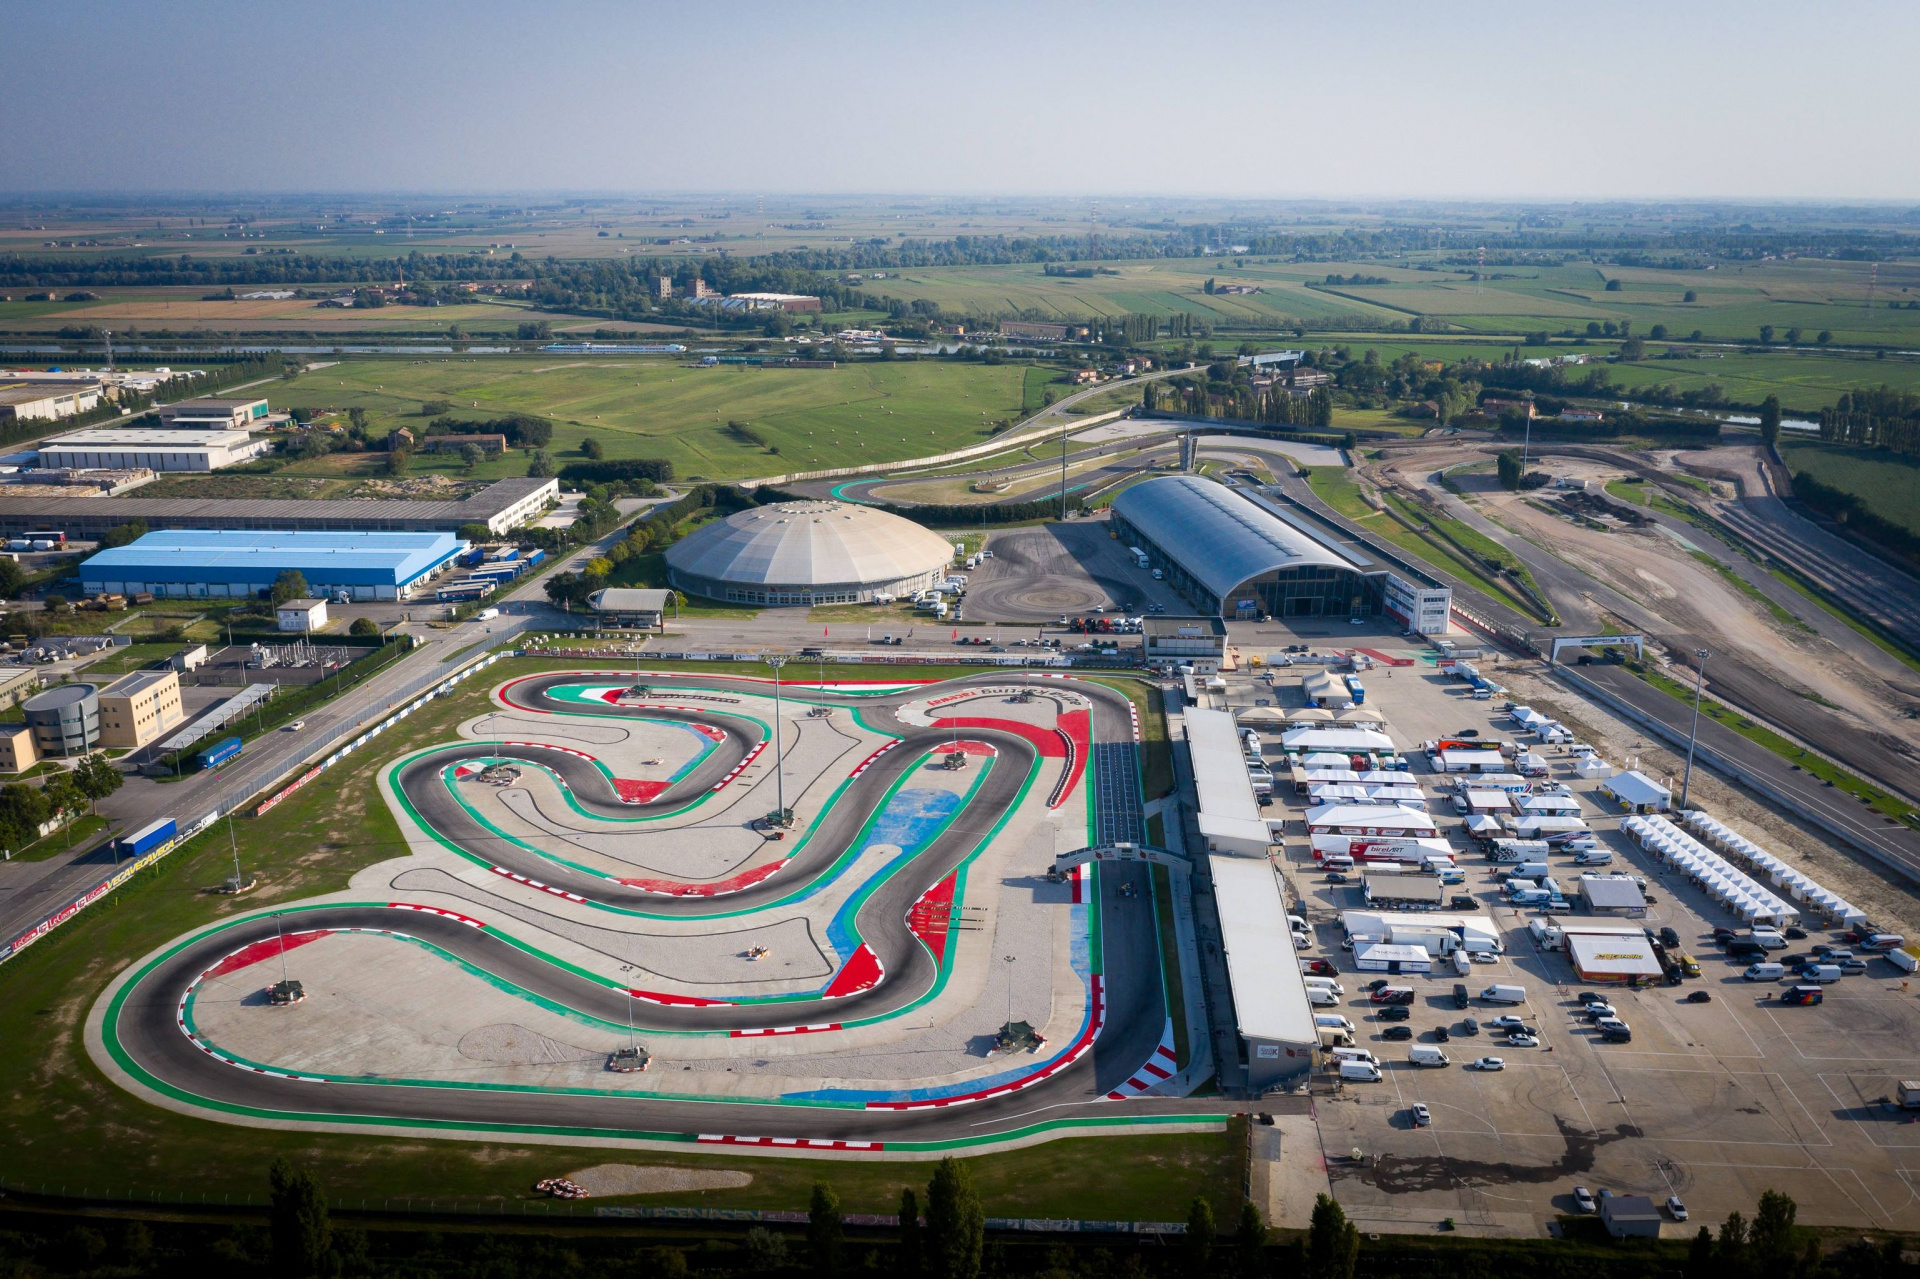 FIA Karting Euro, Adria - KZ and KZ2 final act, who will win?